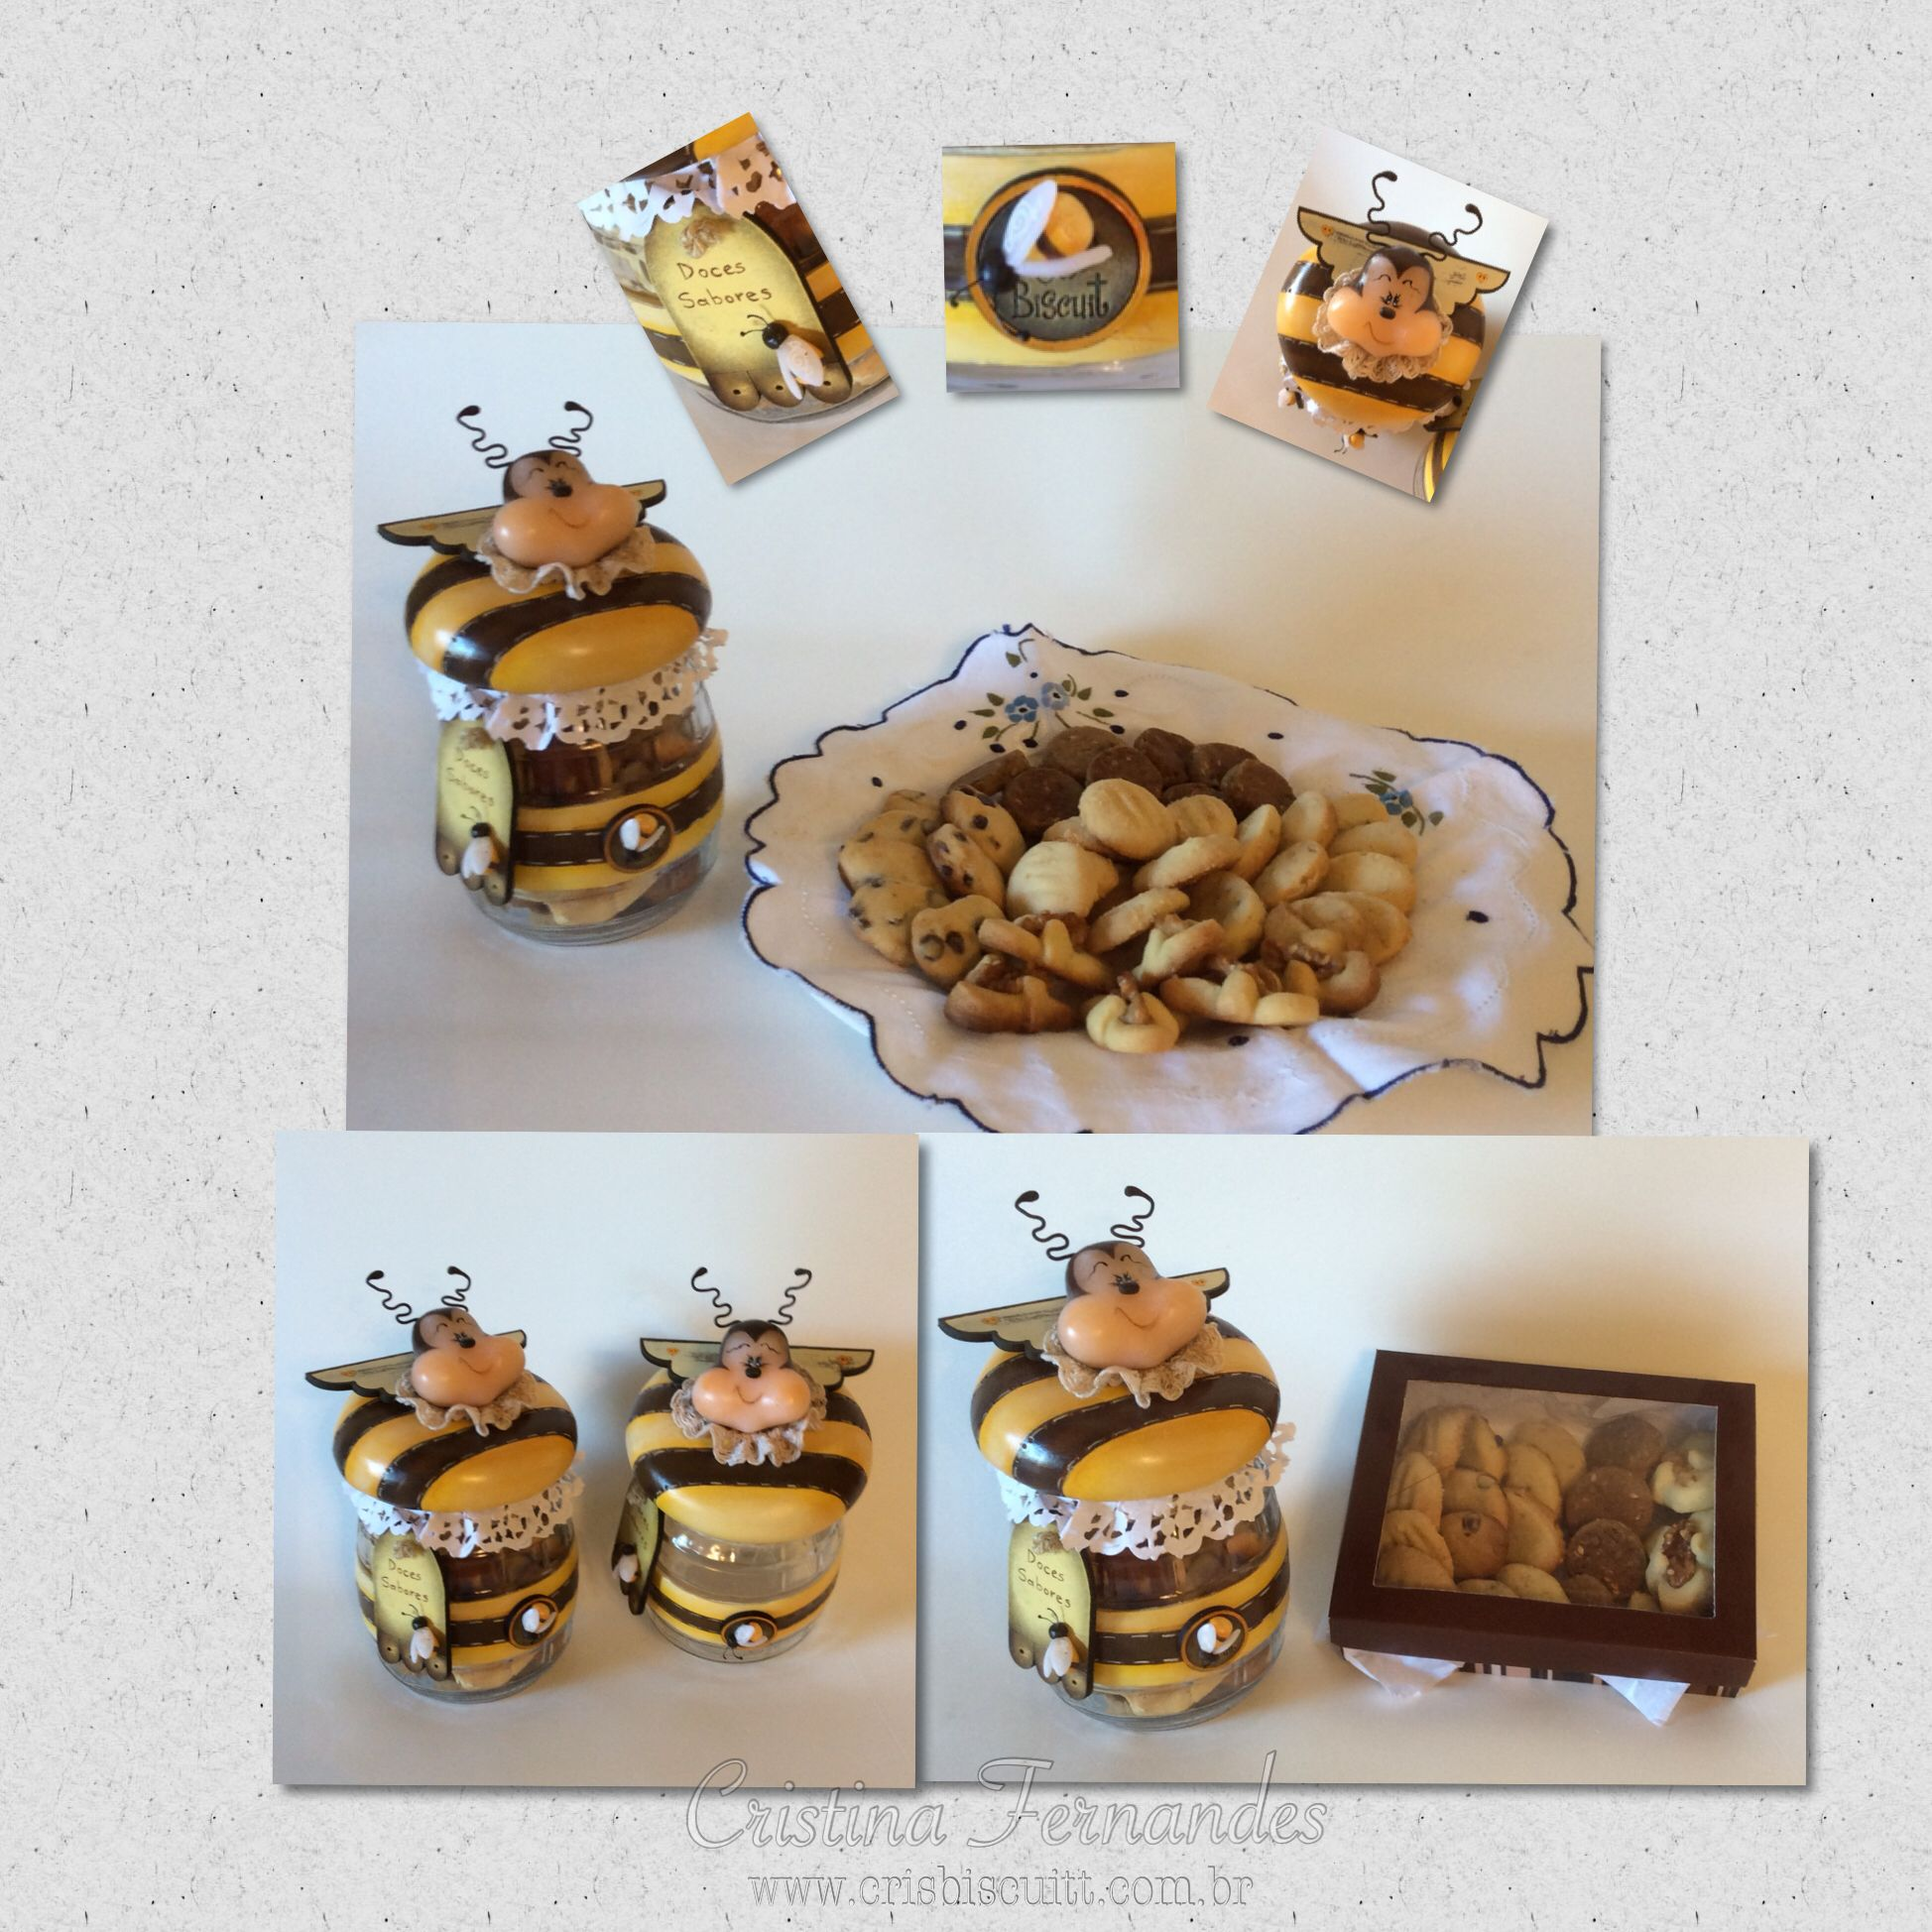 Pote Doce Abelha www.crisbiscuitt.com.br